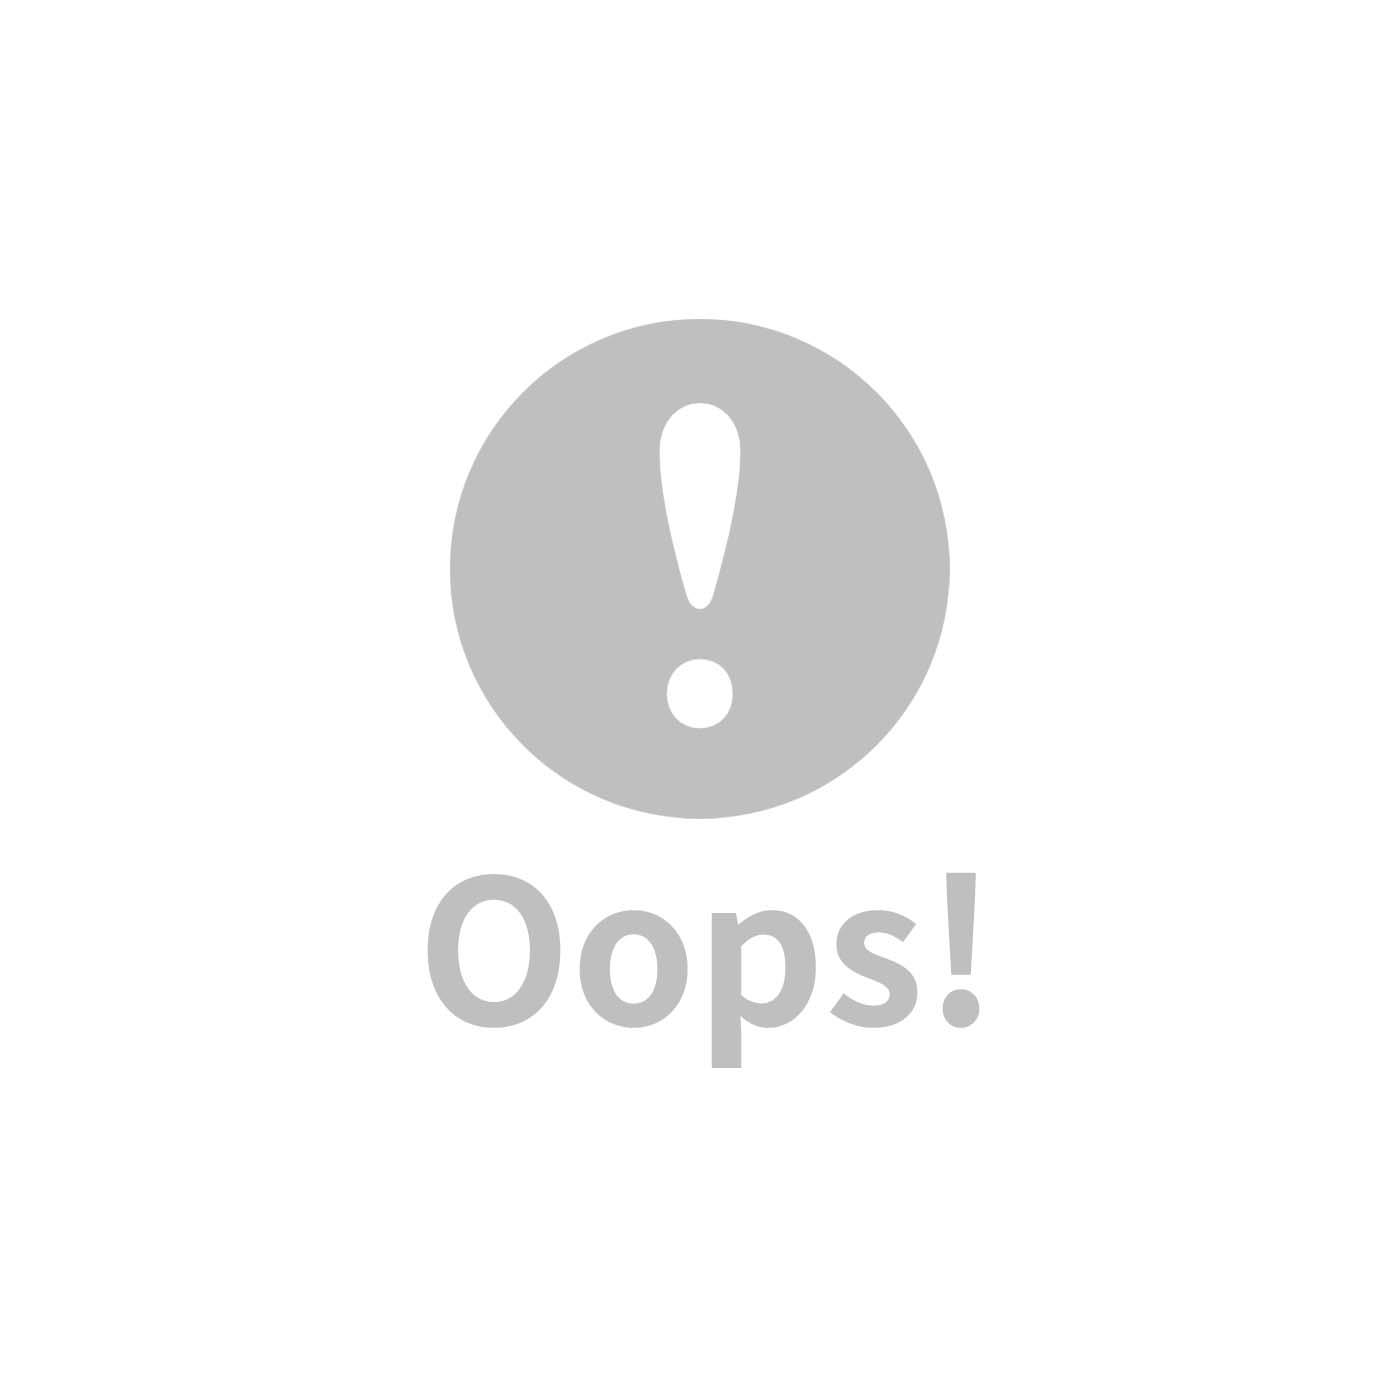 Pacific Baby 美國不鏽鋼保溫太空瓶7oz吸管杯蓋二件組(純真黃7oz+綠配件組)